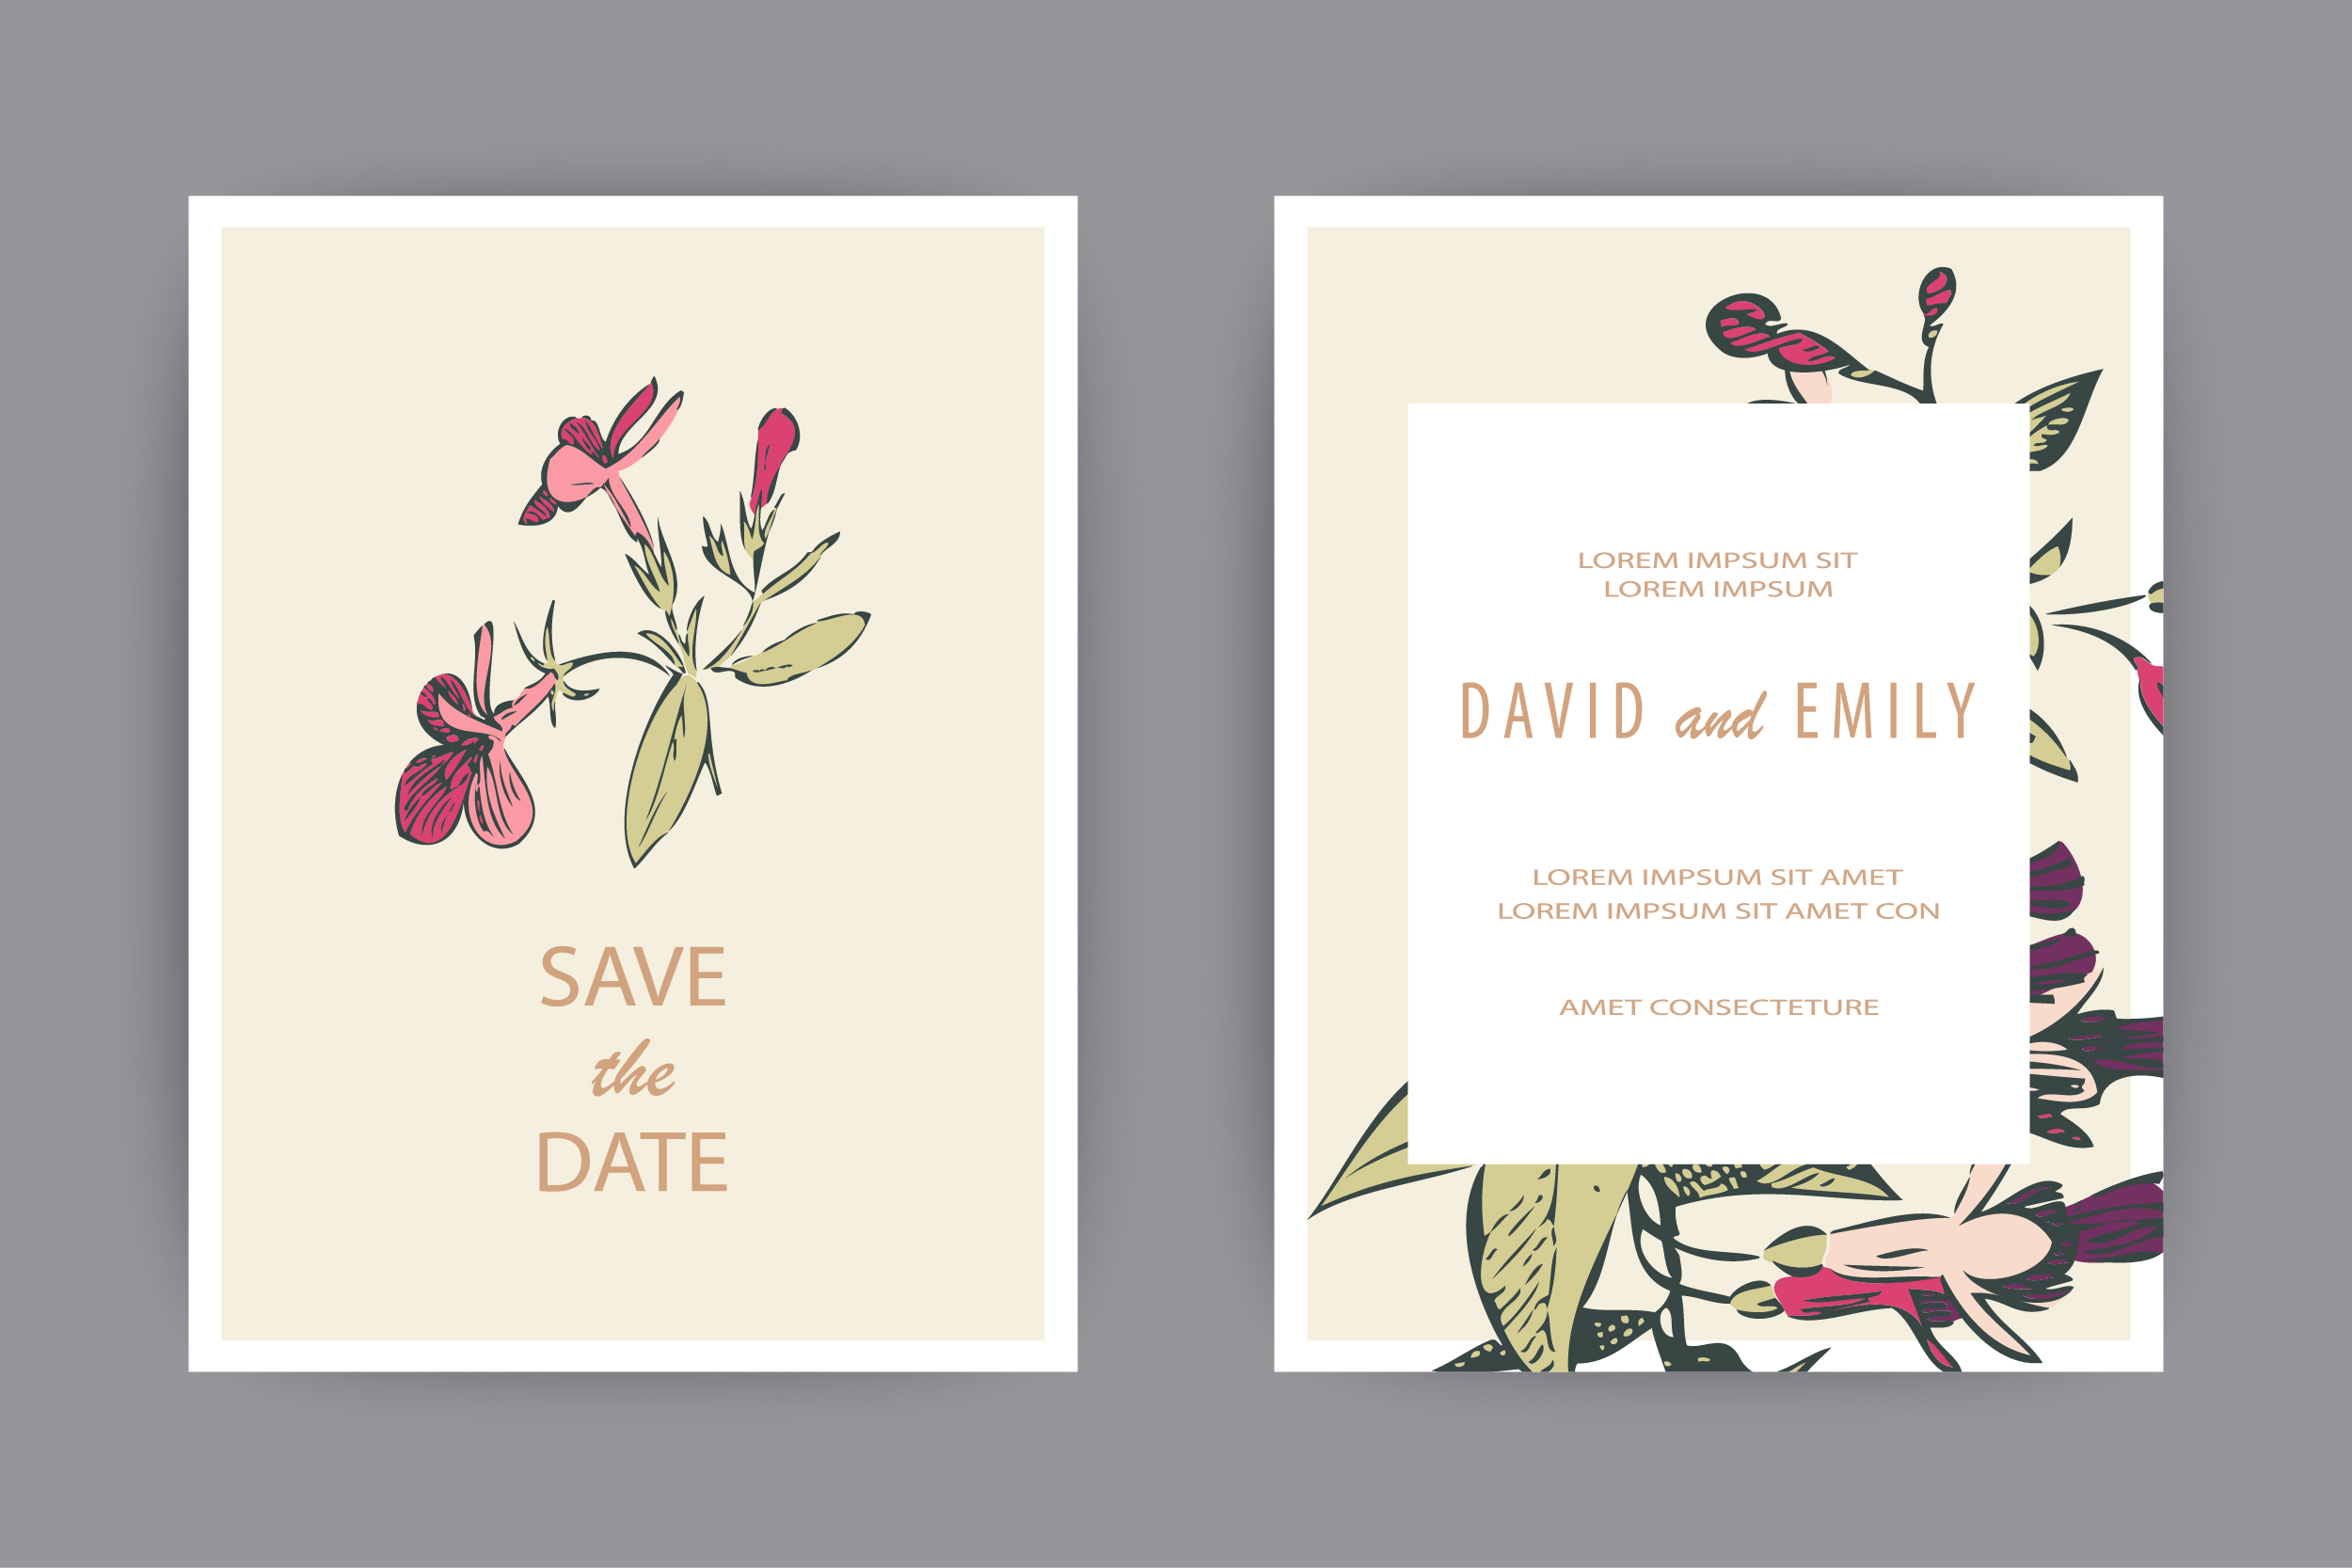 Fuchsia flowers templates for card, invitation, wedding example image 3